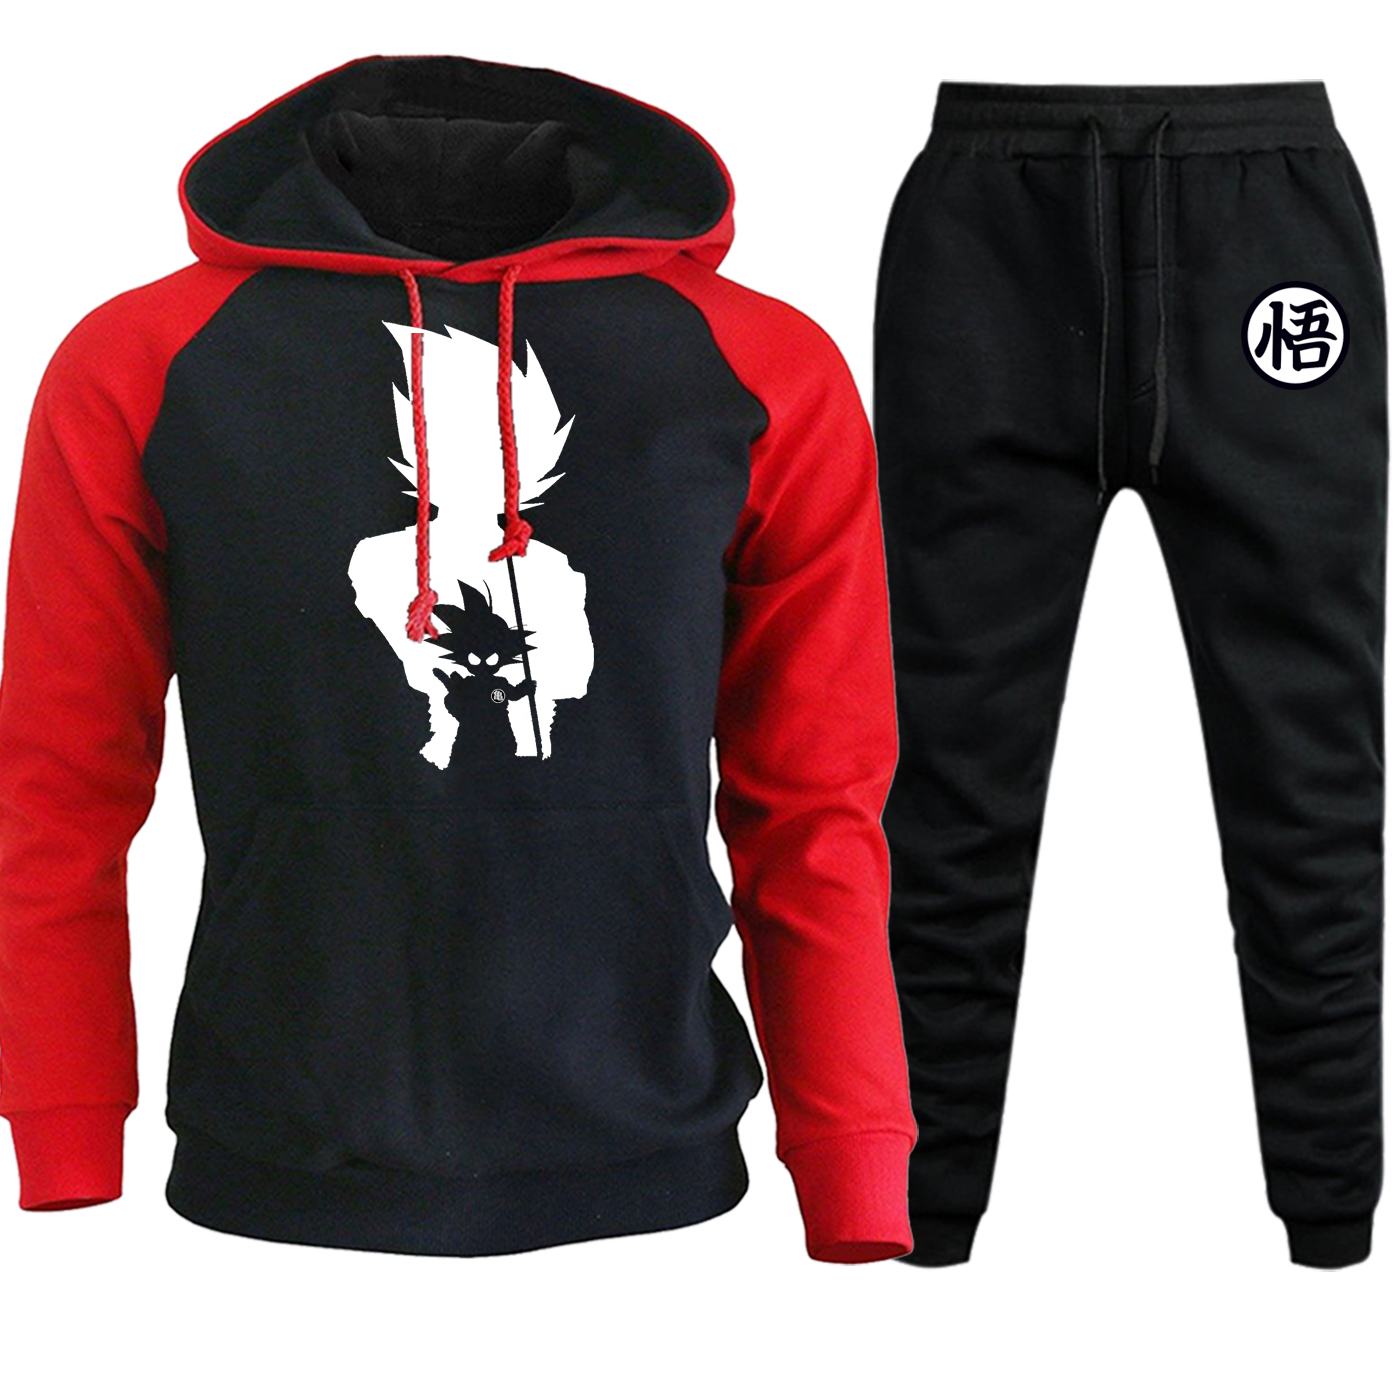 Saiyan Funny Printed Sweatshirts Raglan Men Hoodies Autumn Winter 2019 Hip Hop Draglan Ball Cartoon Suit Hoody+Pants 2 Piece Set